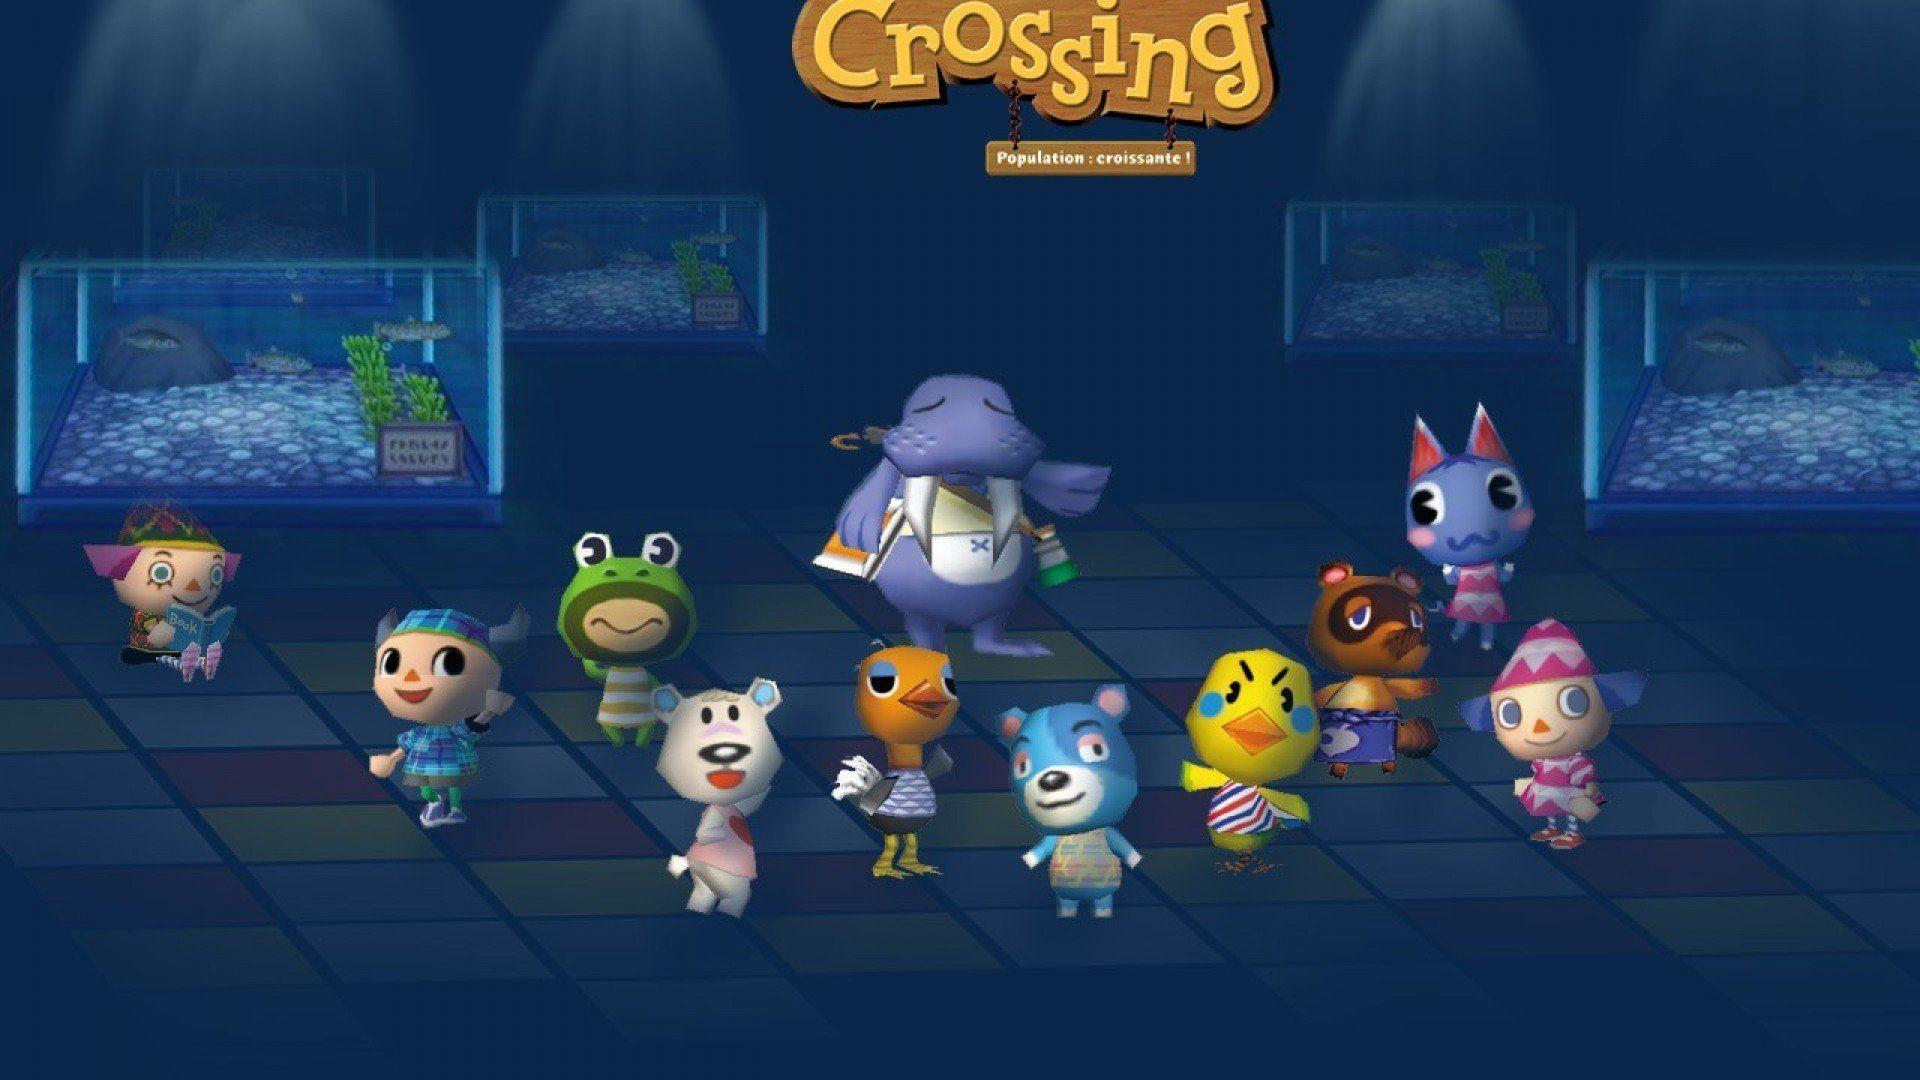 Animal crossing hd wallpaper – Animal Crossing 844217. Download